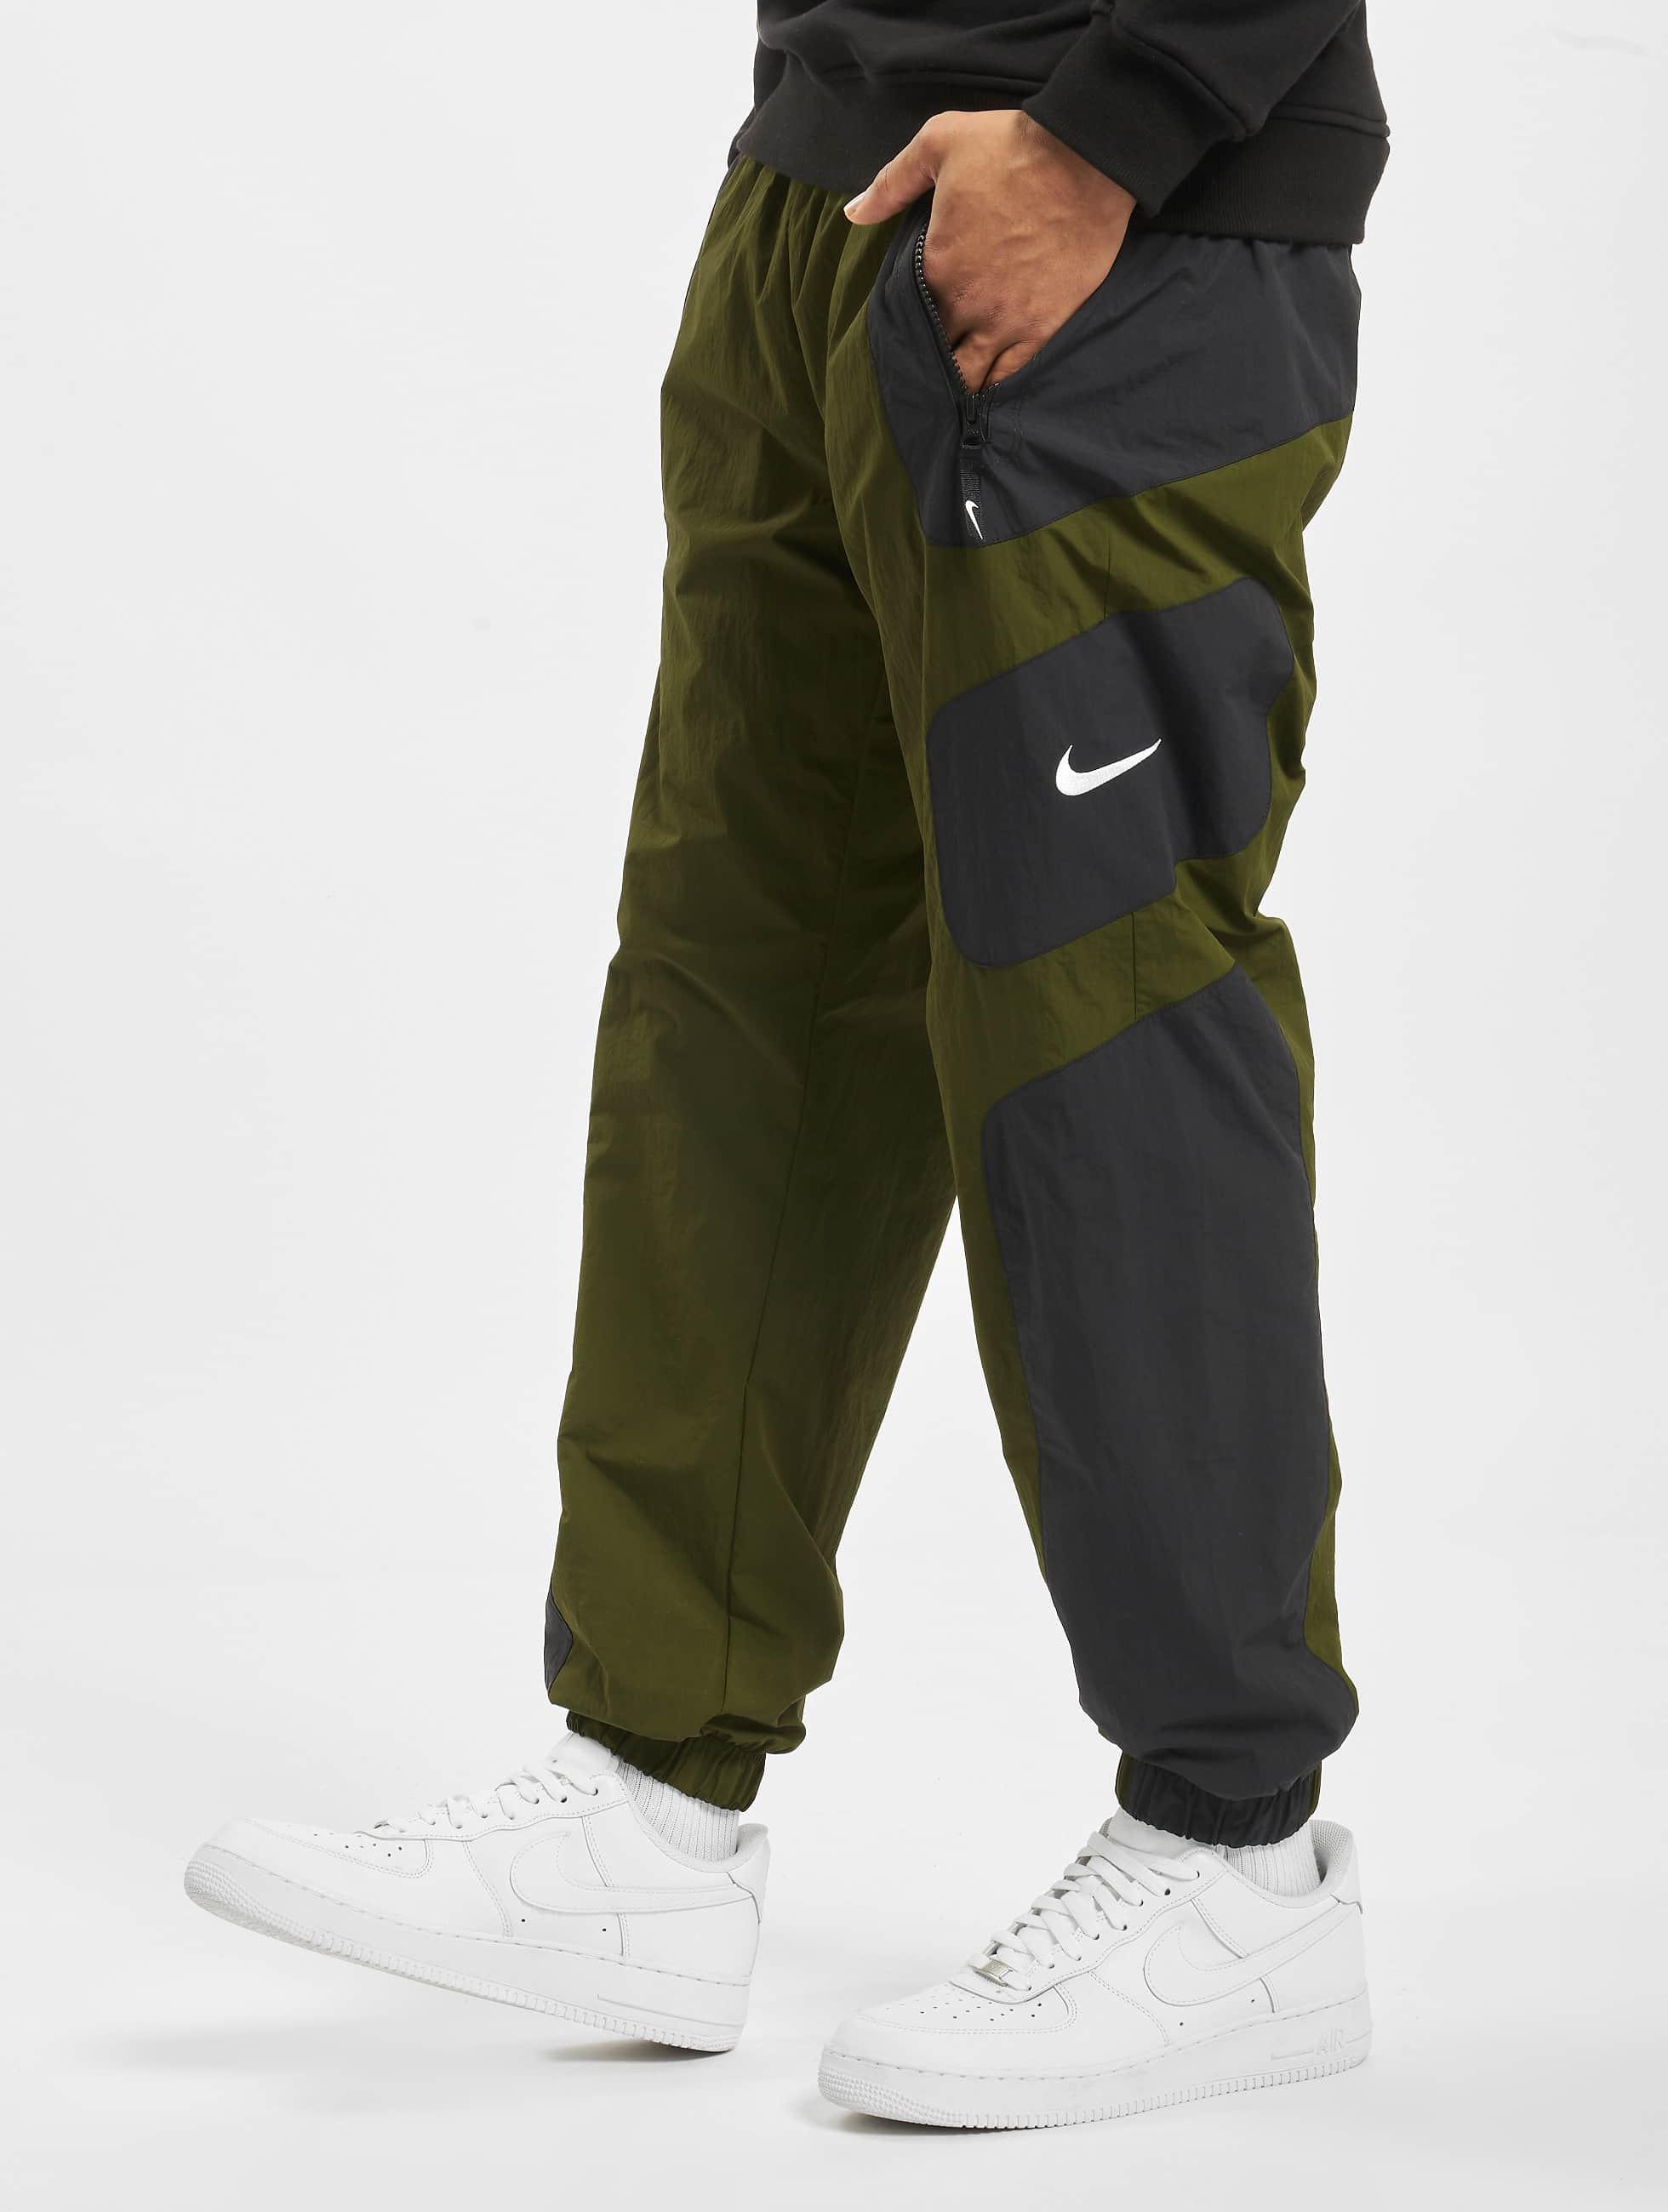 Nike Re Issue Woven Sweat Pants BlackLegion GreenWhite